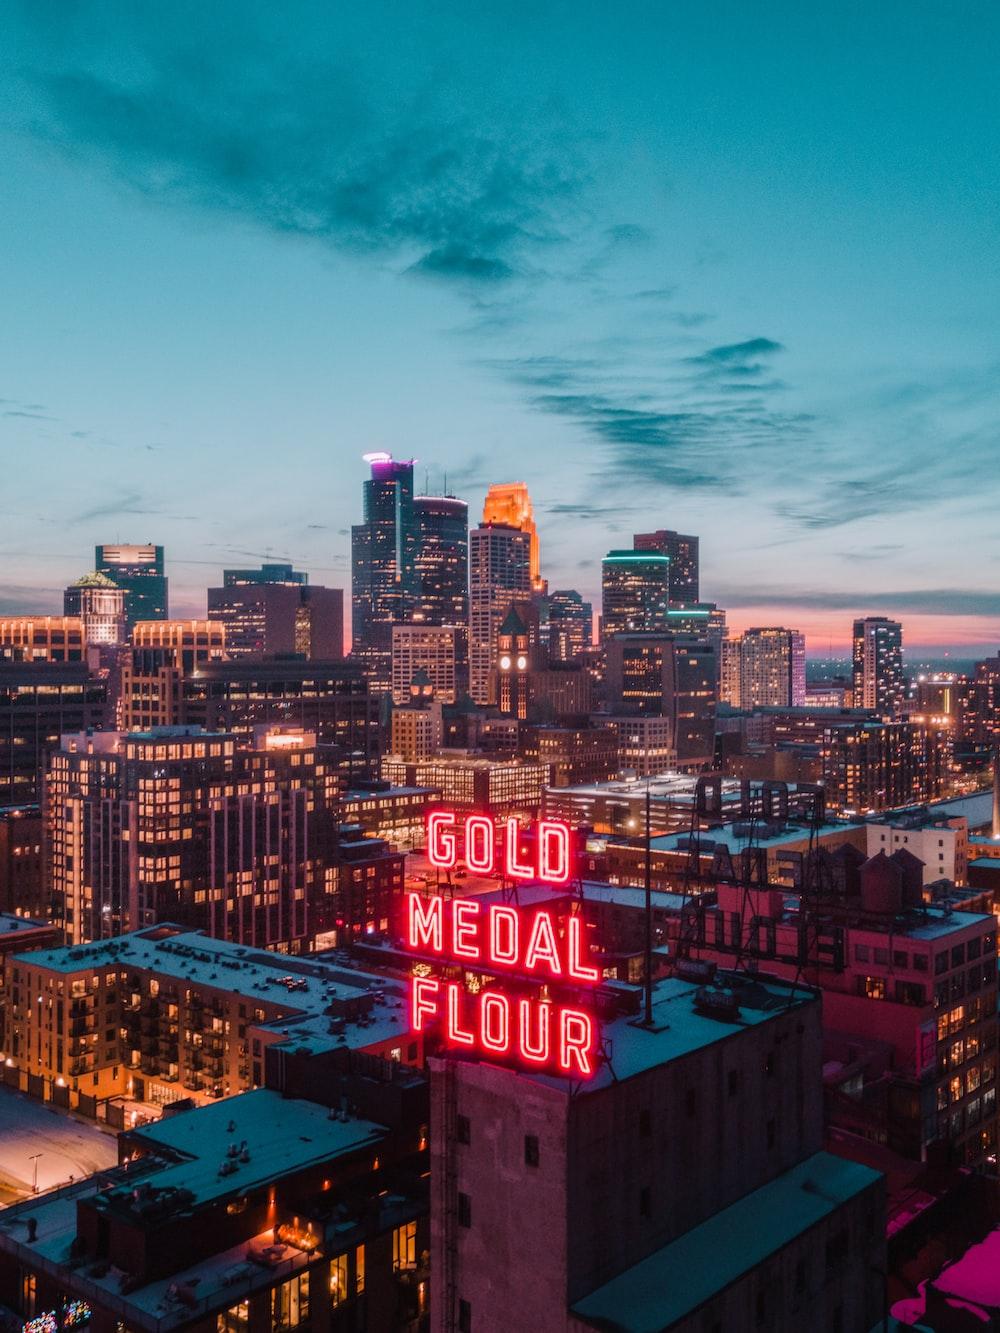 city skyline under blue sky during night time